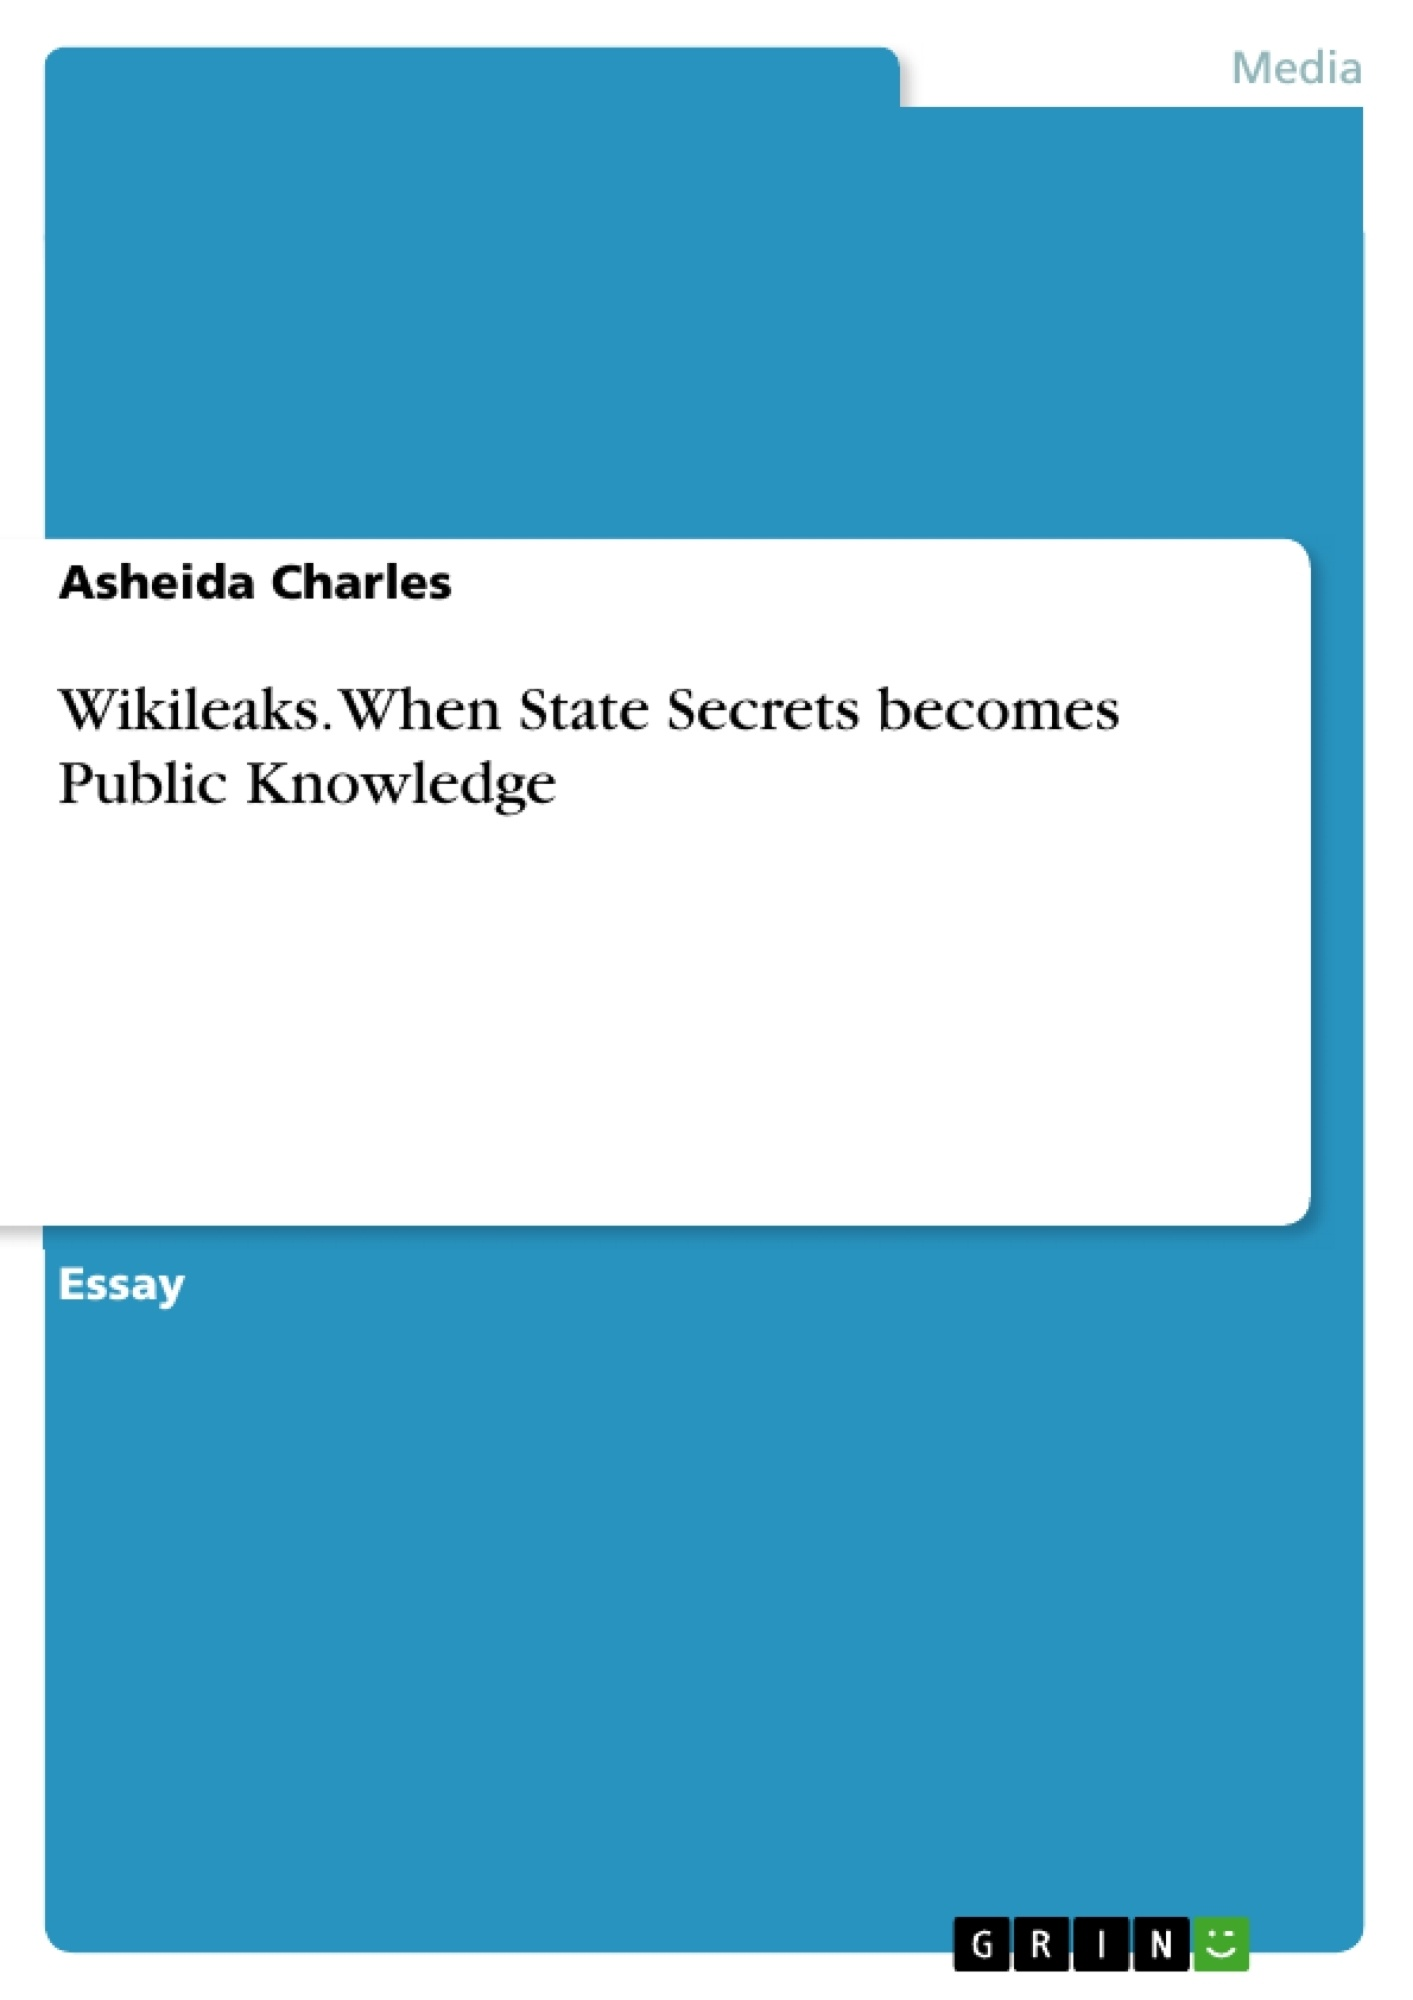 Title: Wikileaks. When State Secrets becomes Public Knowledge